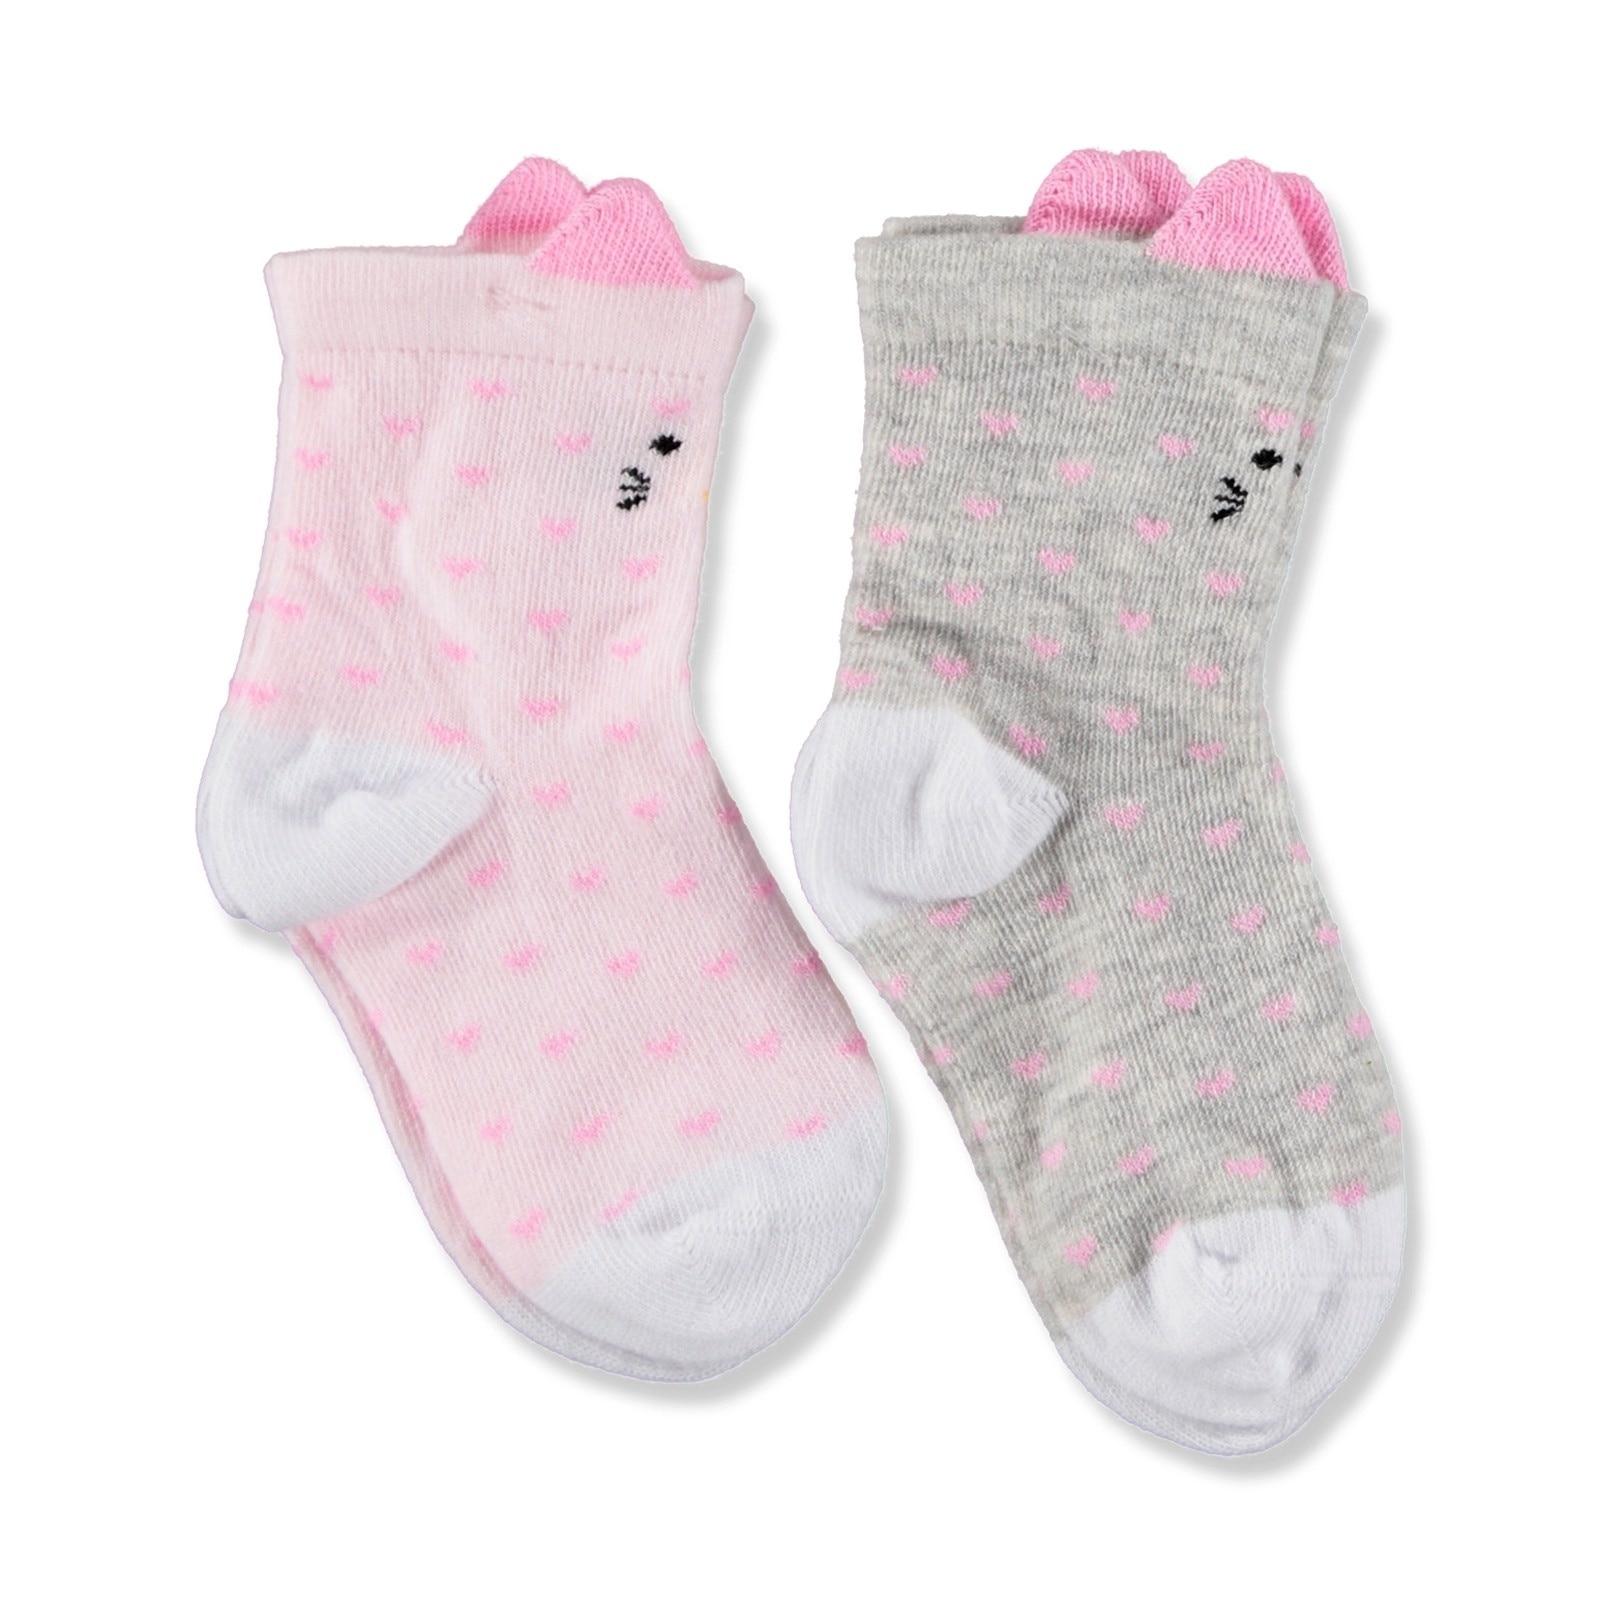 Ebebek Aziz Bebe Baby Socks 2 Pack